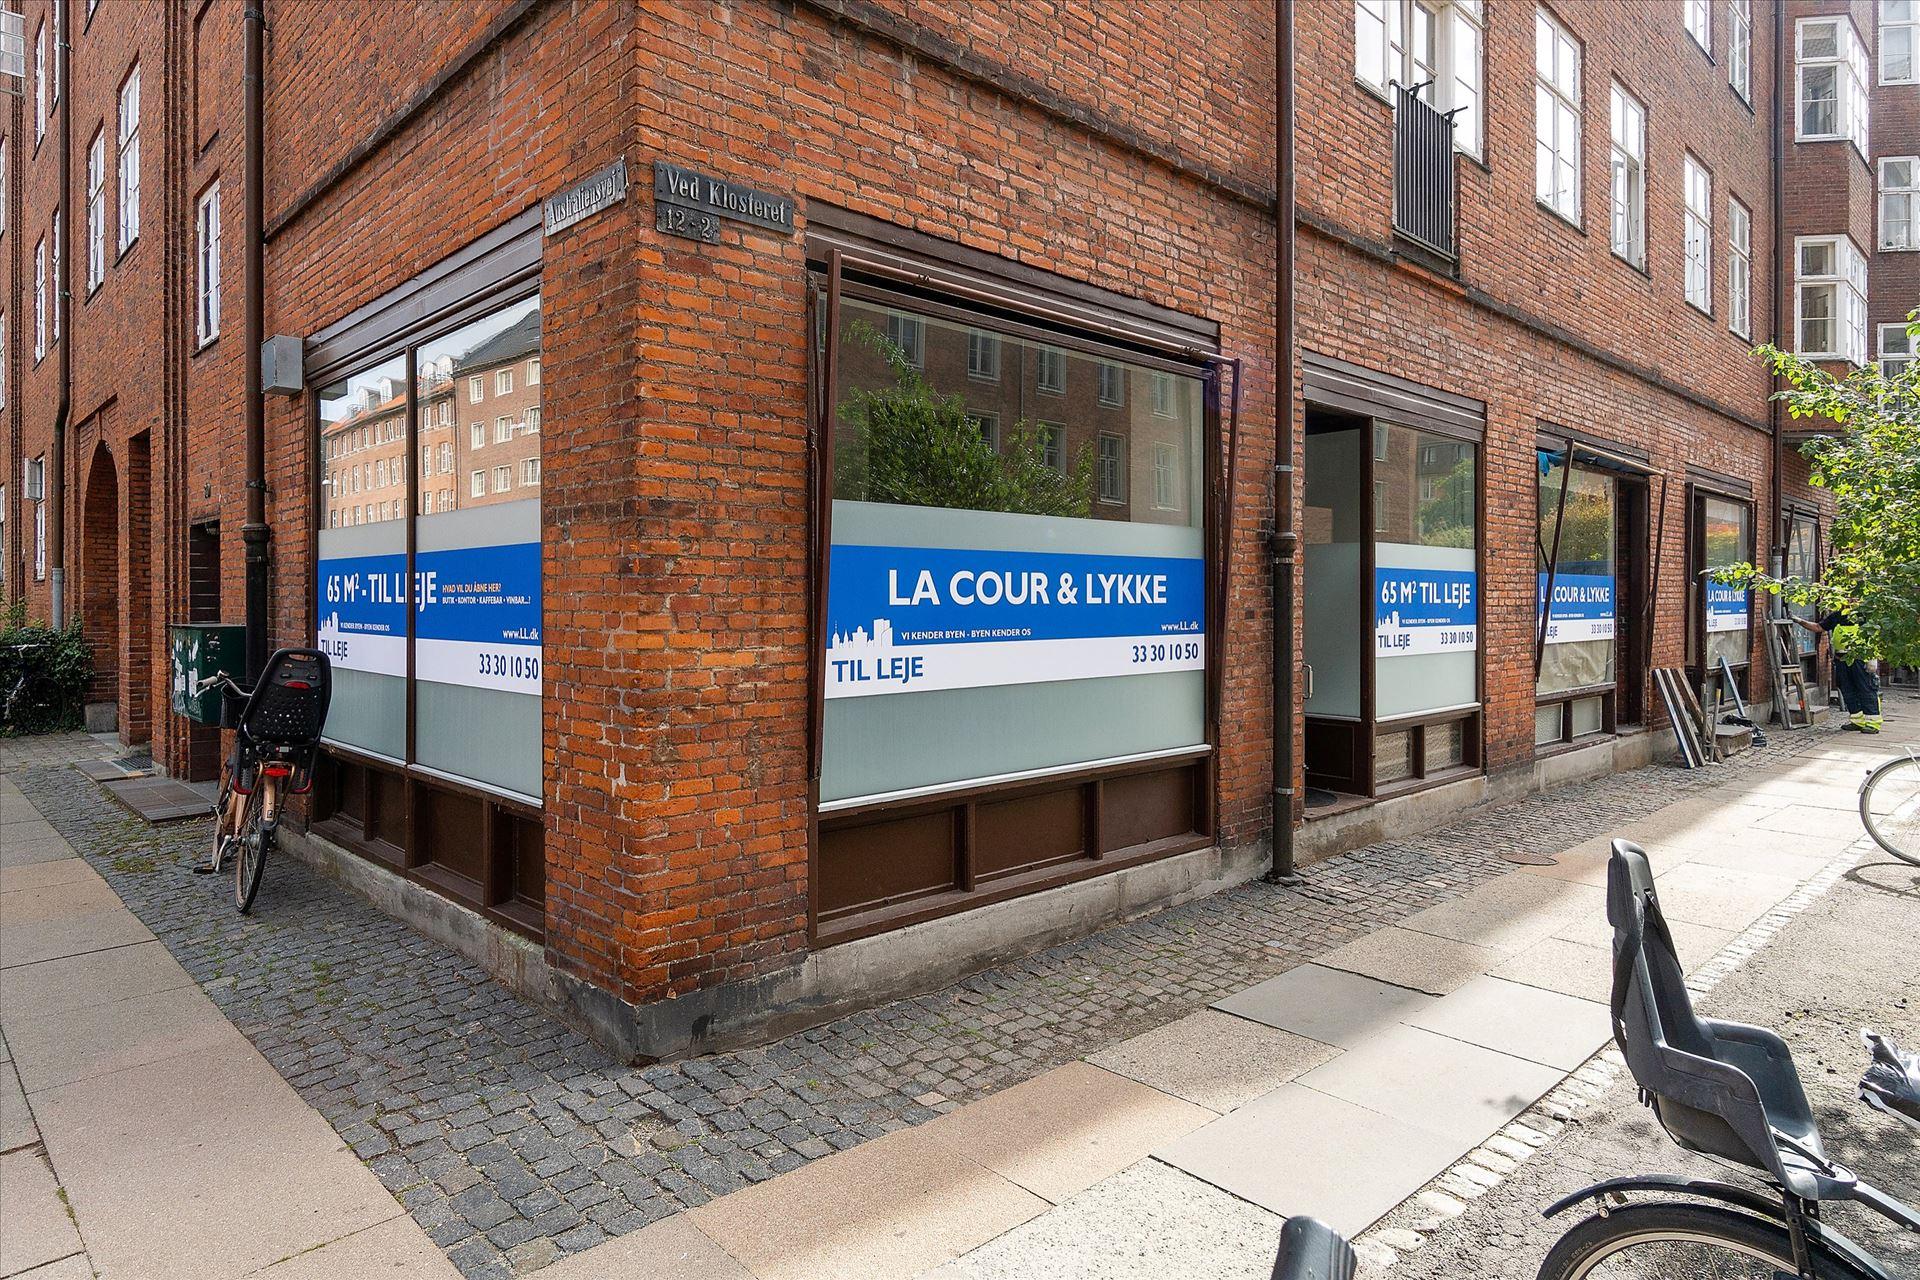 65 m² momsfri butik på Østerbro